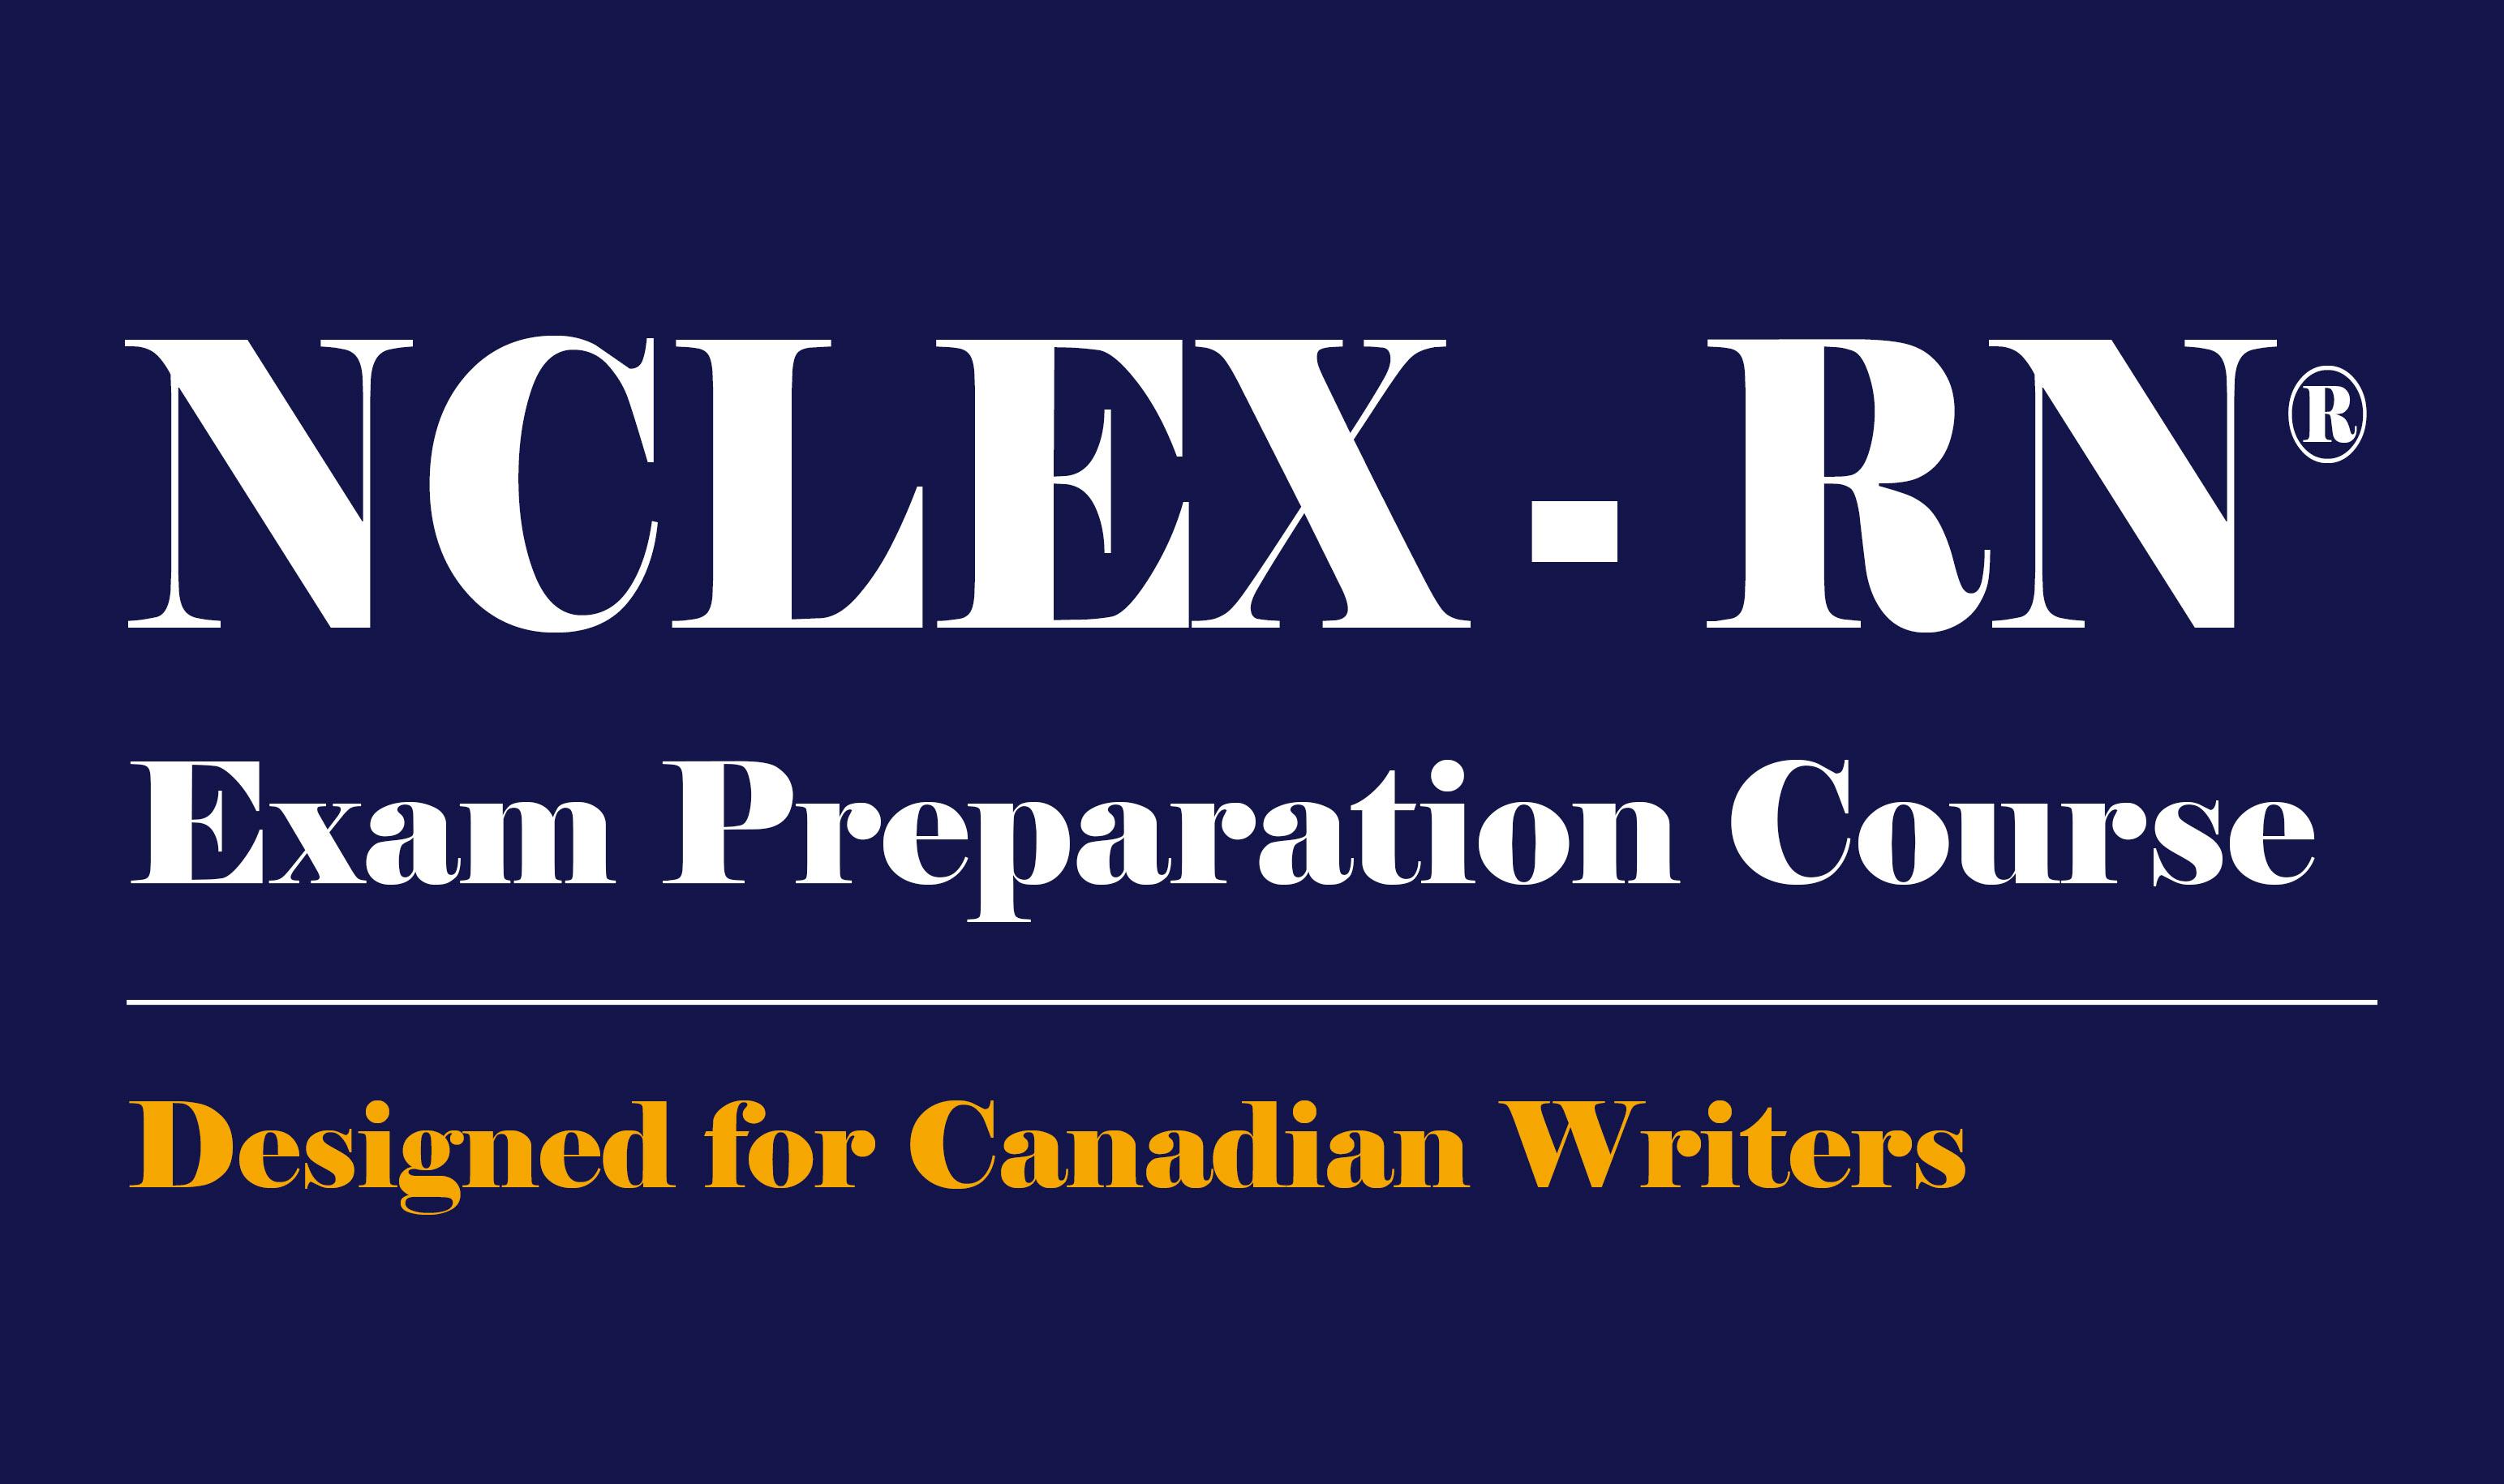 Nclex Rn Exam Prep Course